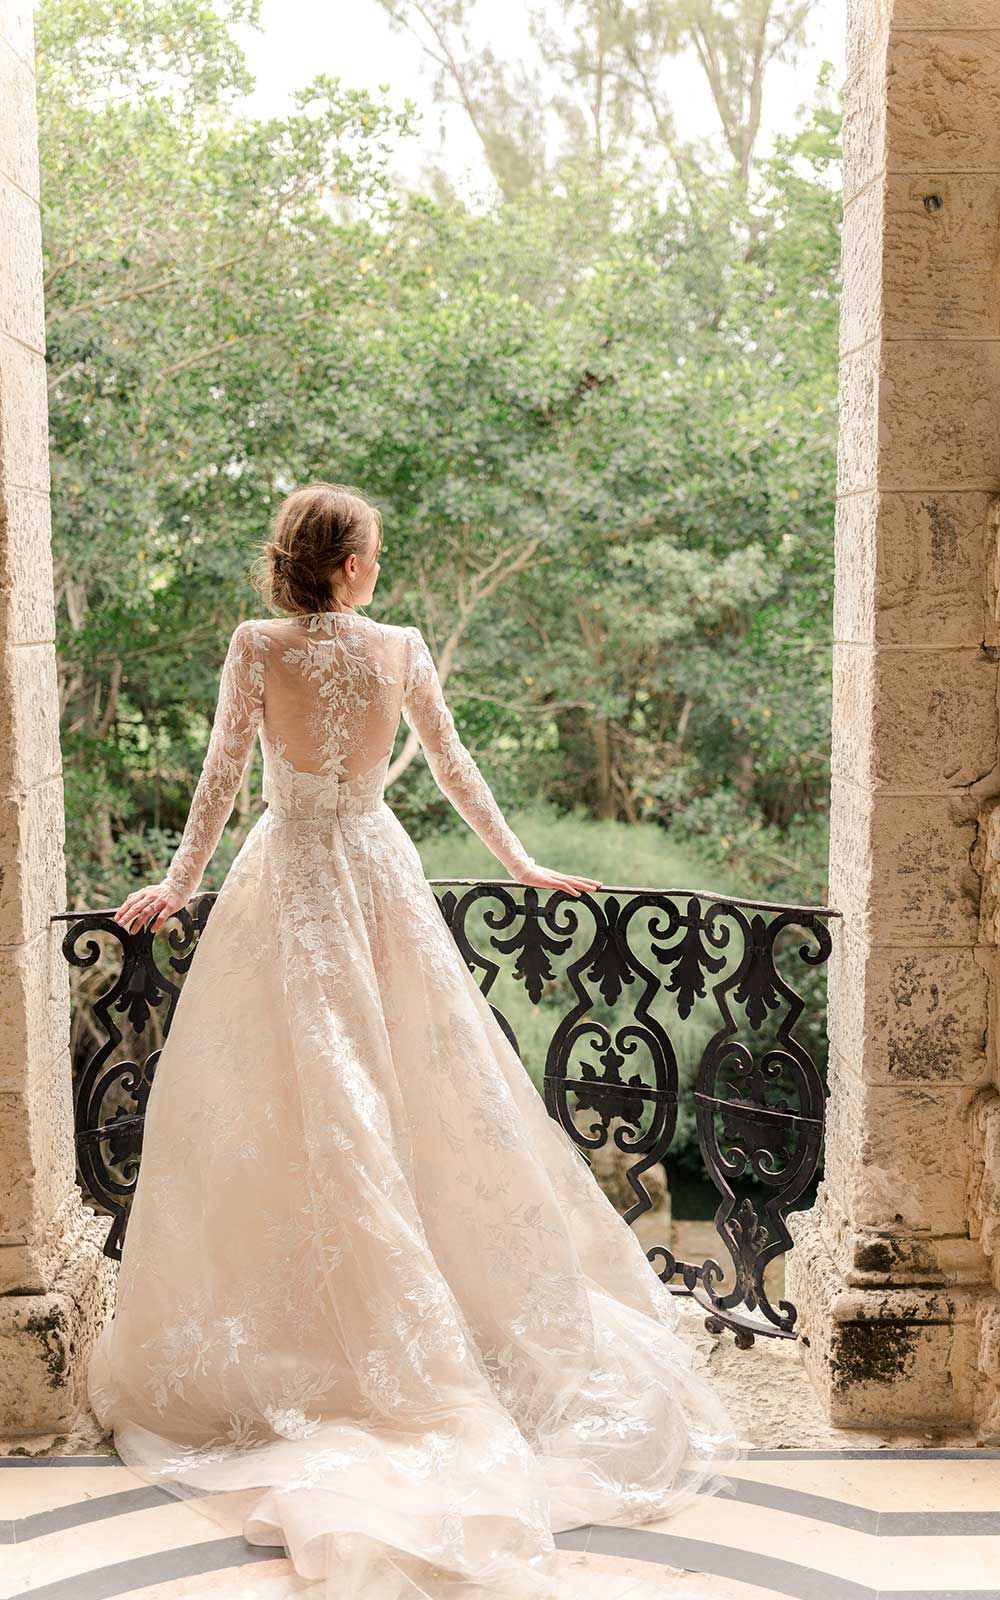 10 Best Bridal Boutiques In Hong Kong To Find Your Dream Wedding Dress Tatler Hong Kong